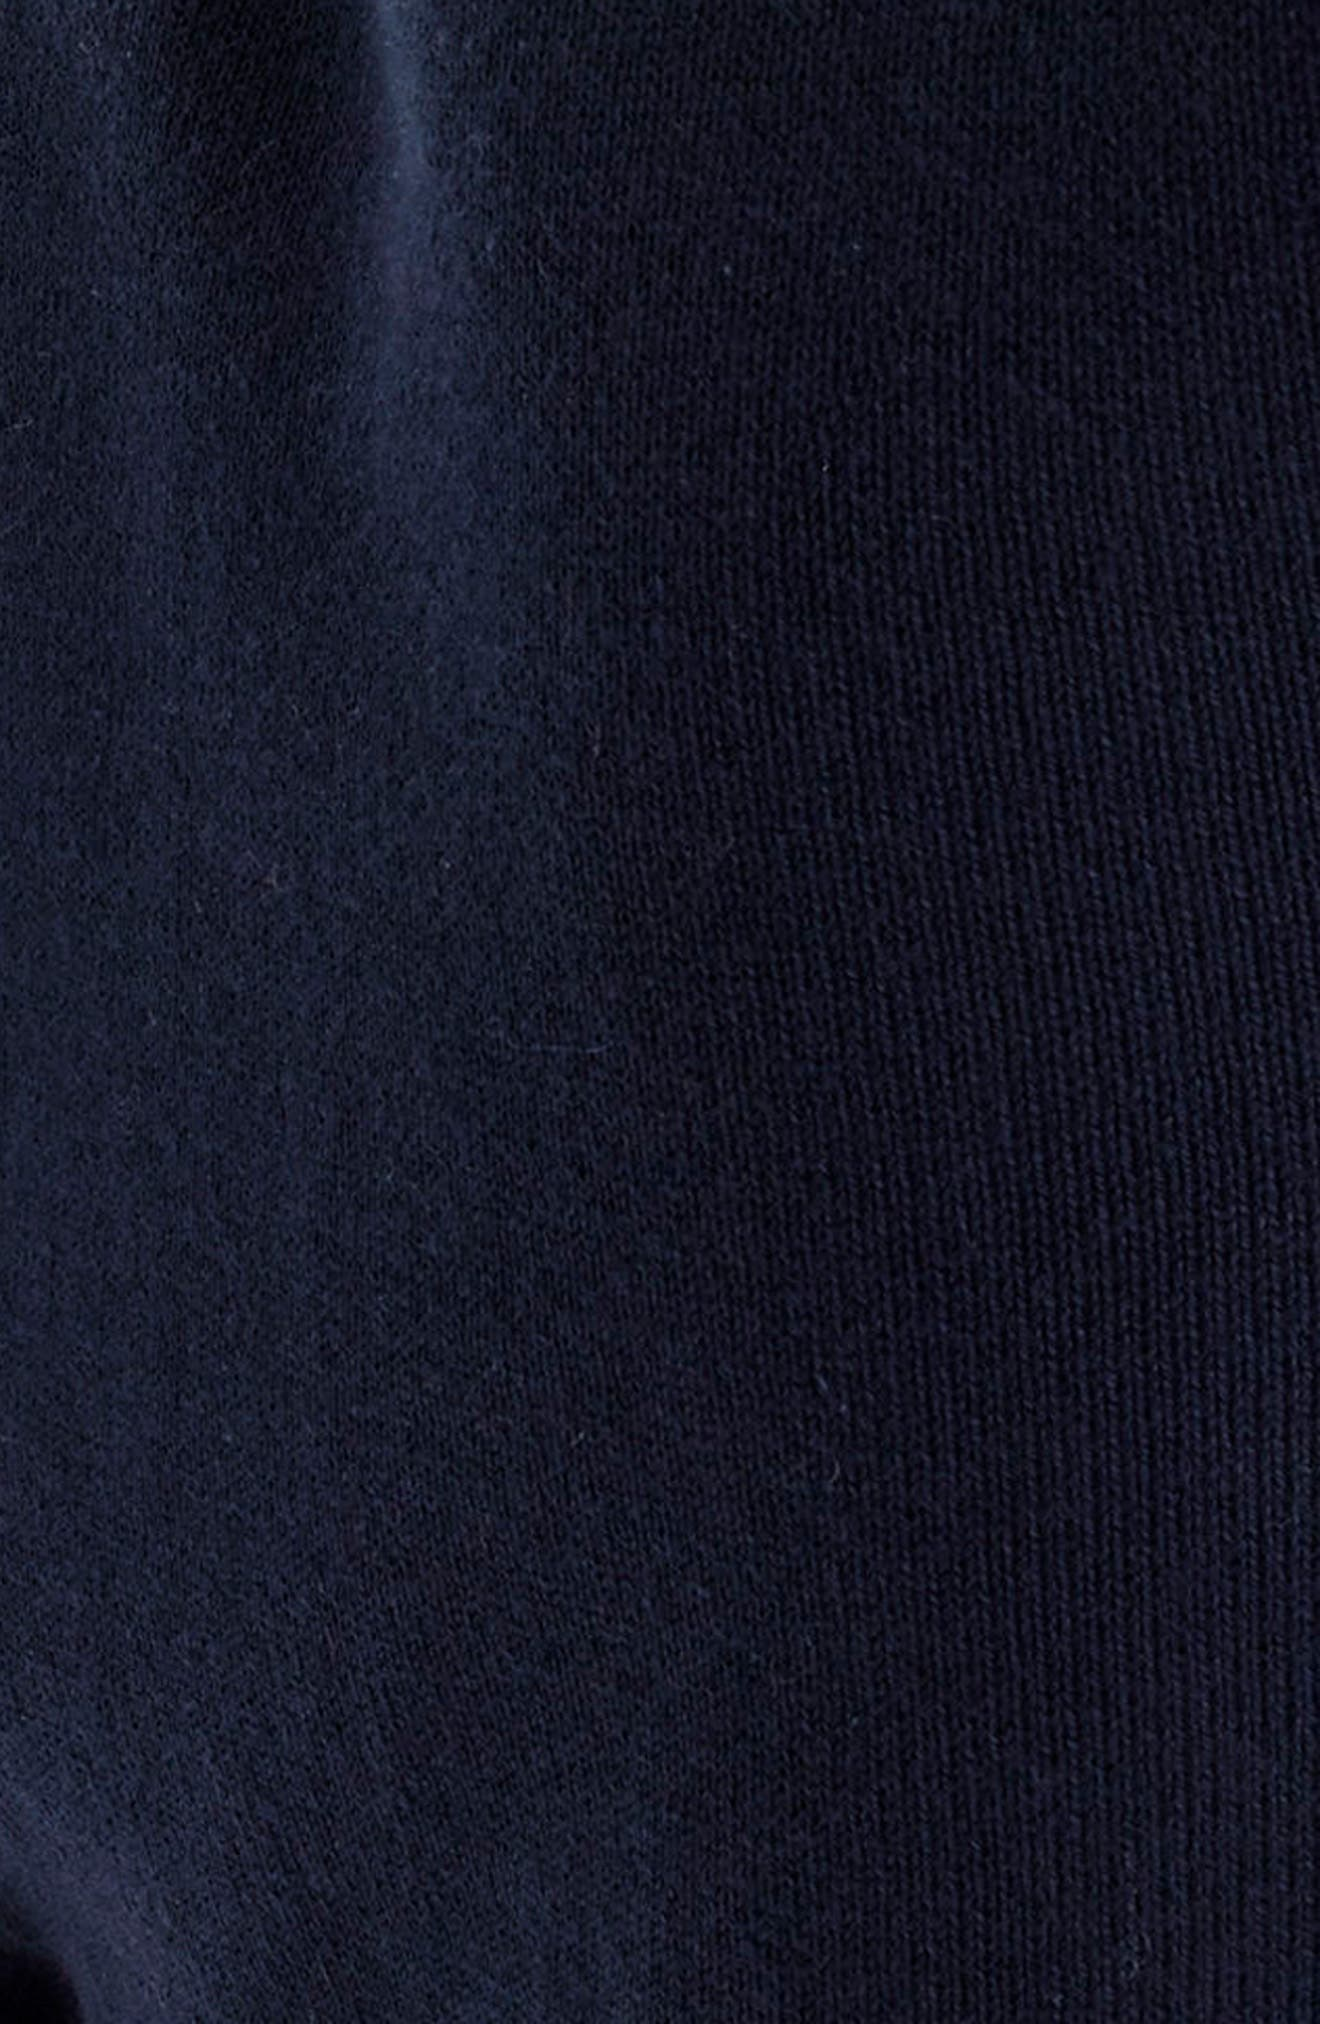 Ruffle V-Neck Sweater,                             Alternate thumbnail 4, color,